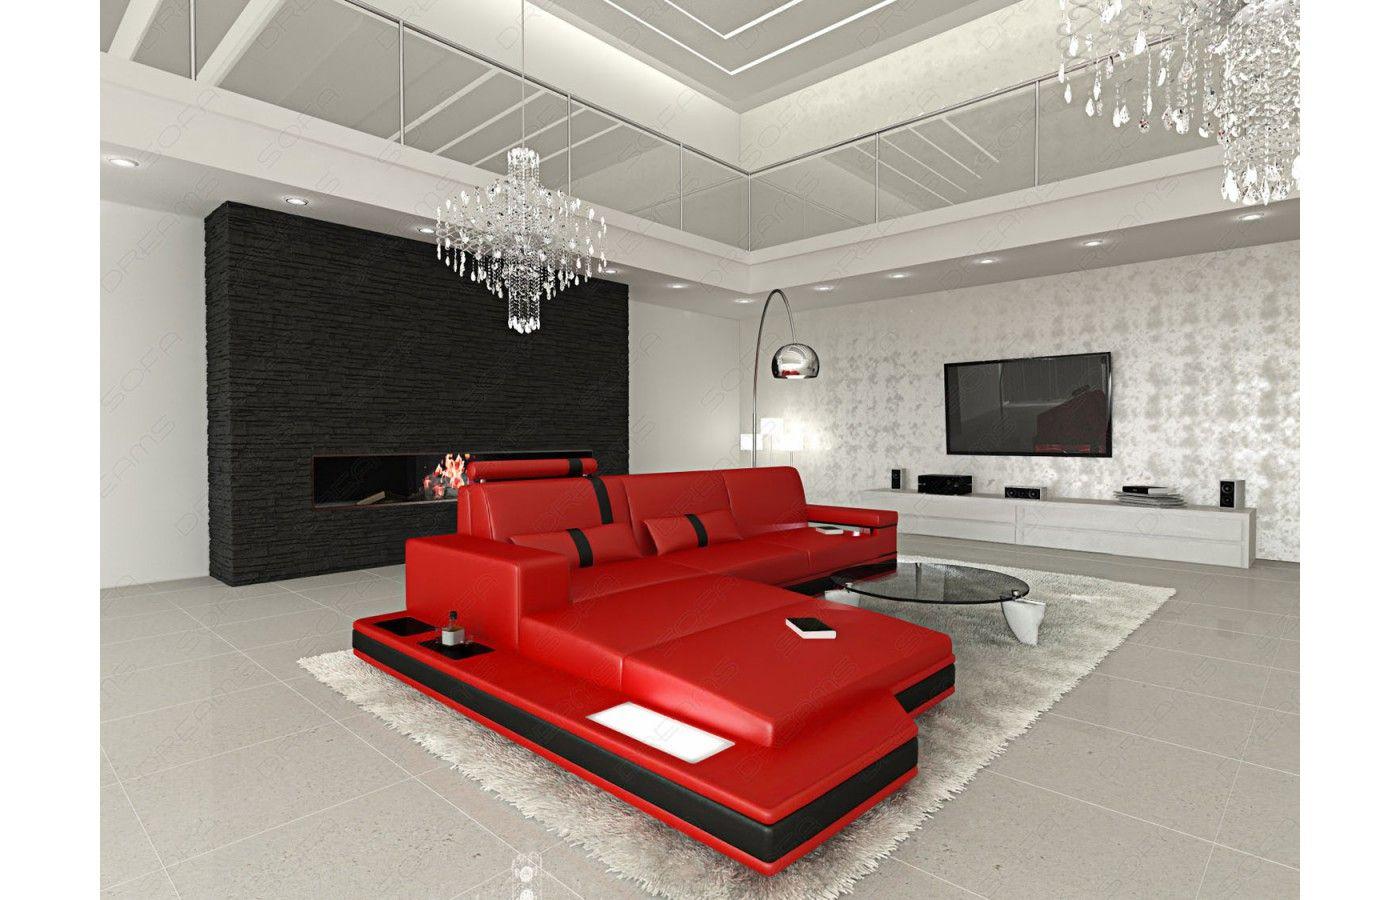 Perfect Exklusive Designerm bel bei Sofa Dreams Ledersofa MESSANA in L Form mit